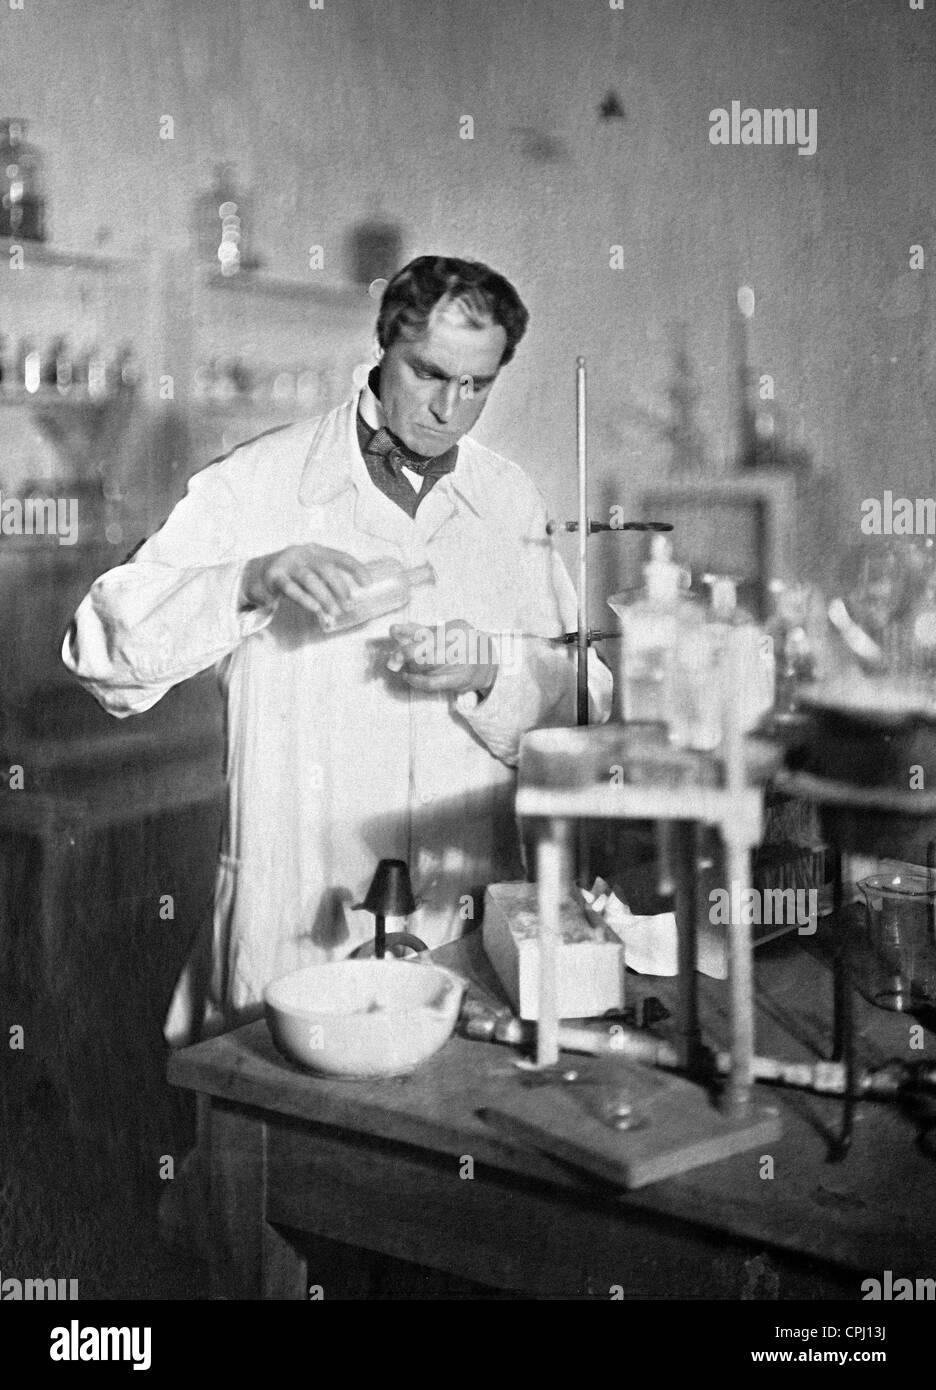 Albert Bassermann in 'The Creator' - Stock Image